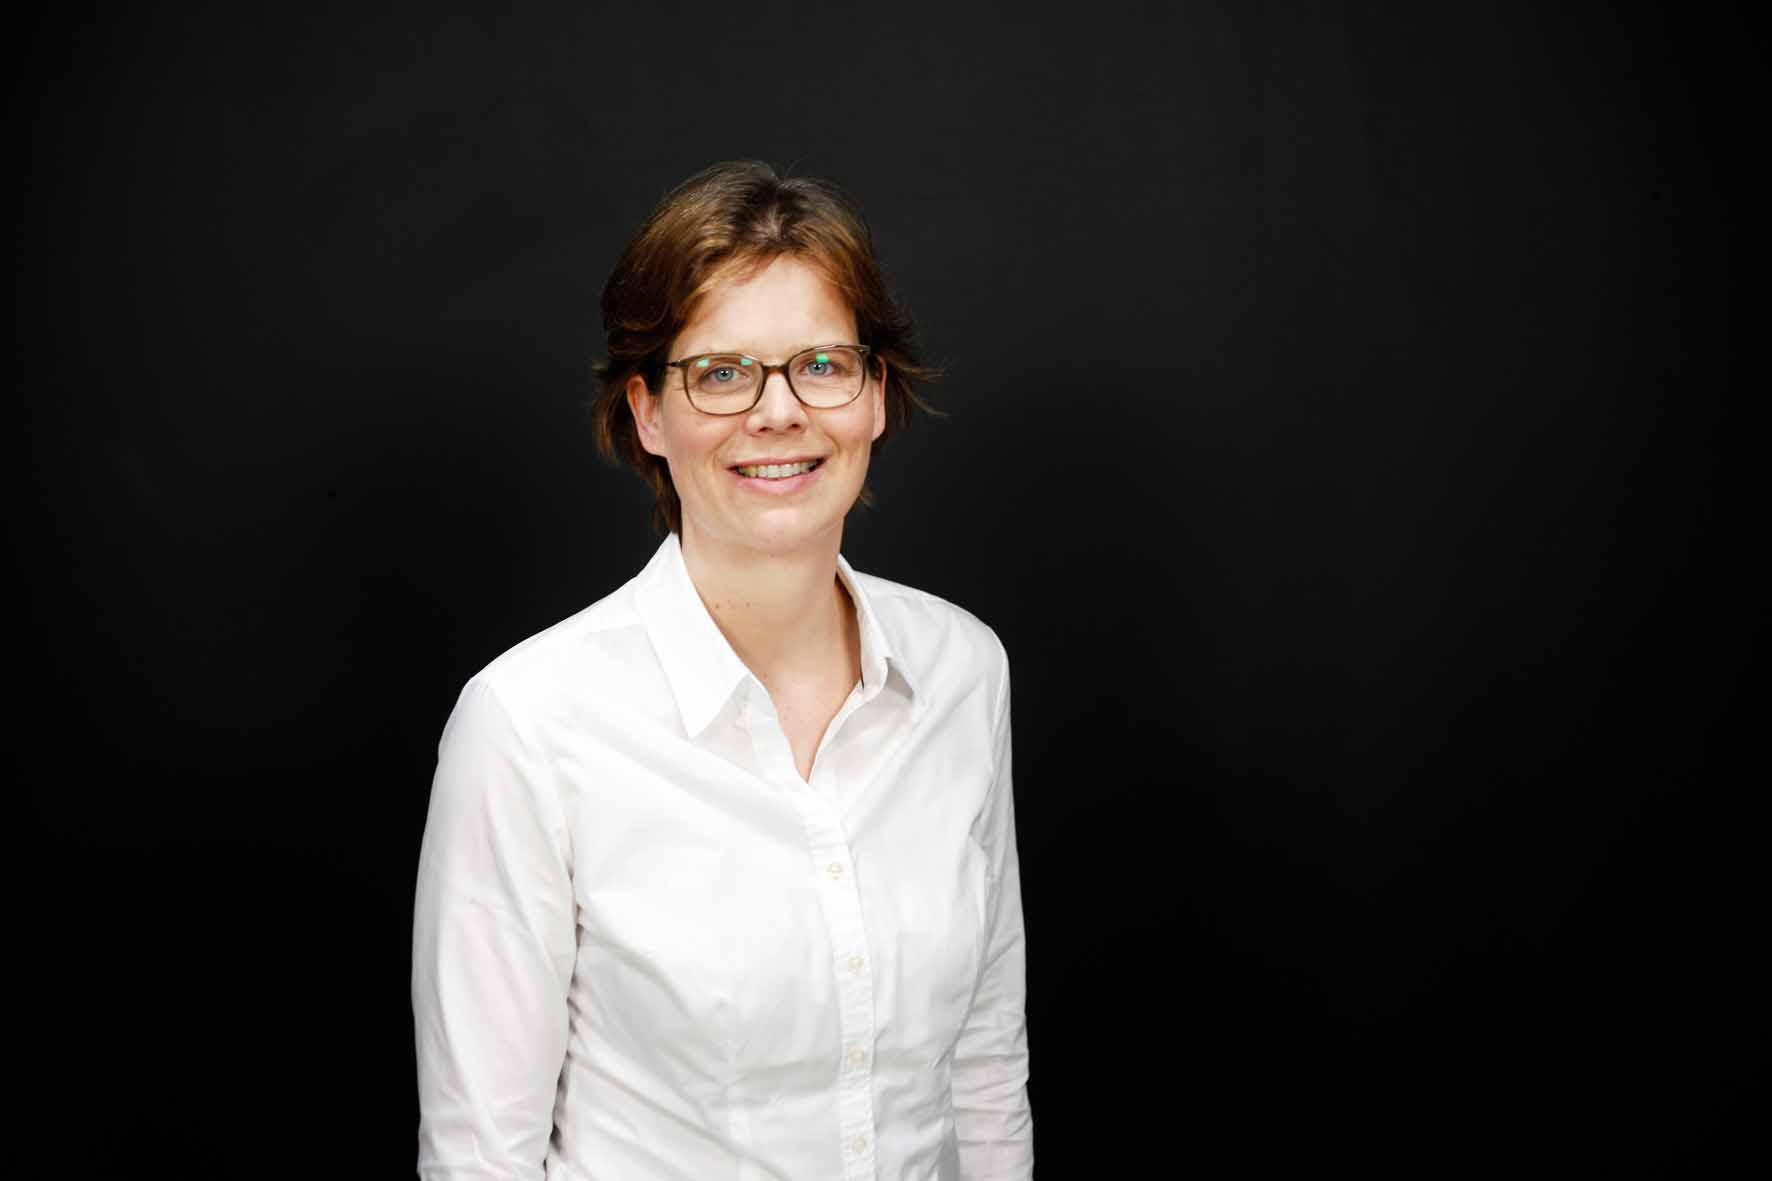 Sandra Dierkes, Prokuristin der neuen Gesellschaft © ieQ-systems mgk GmbH